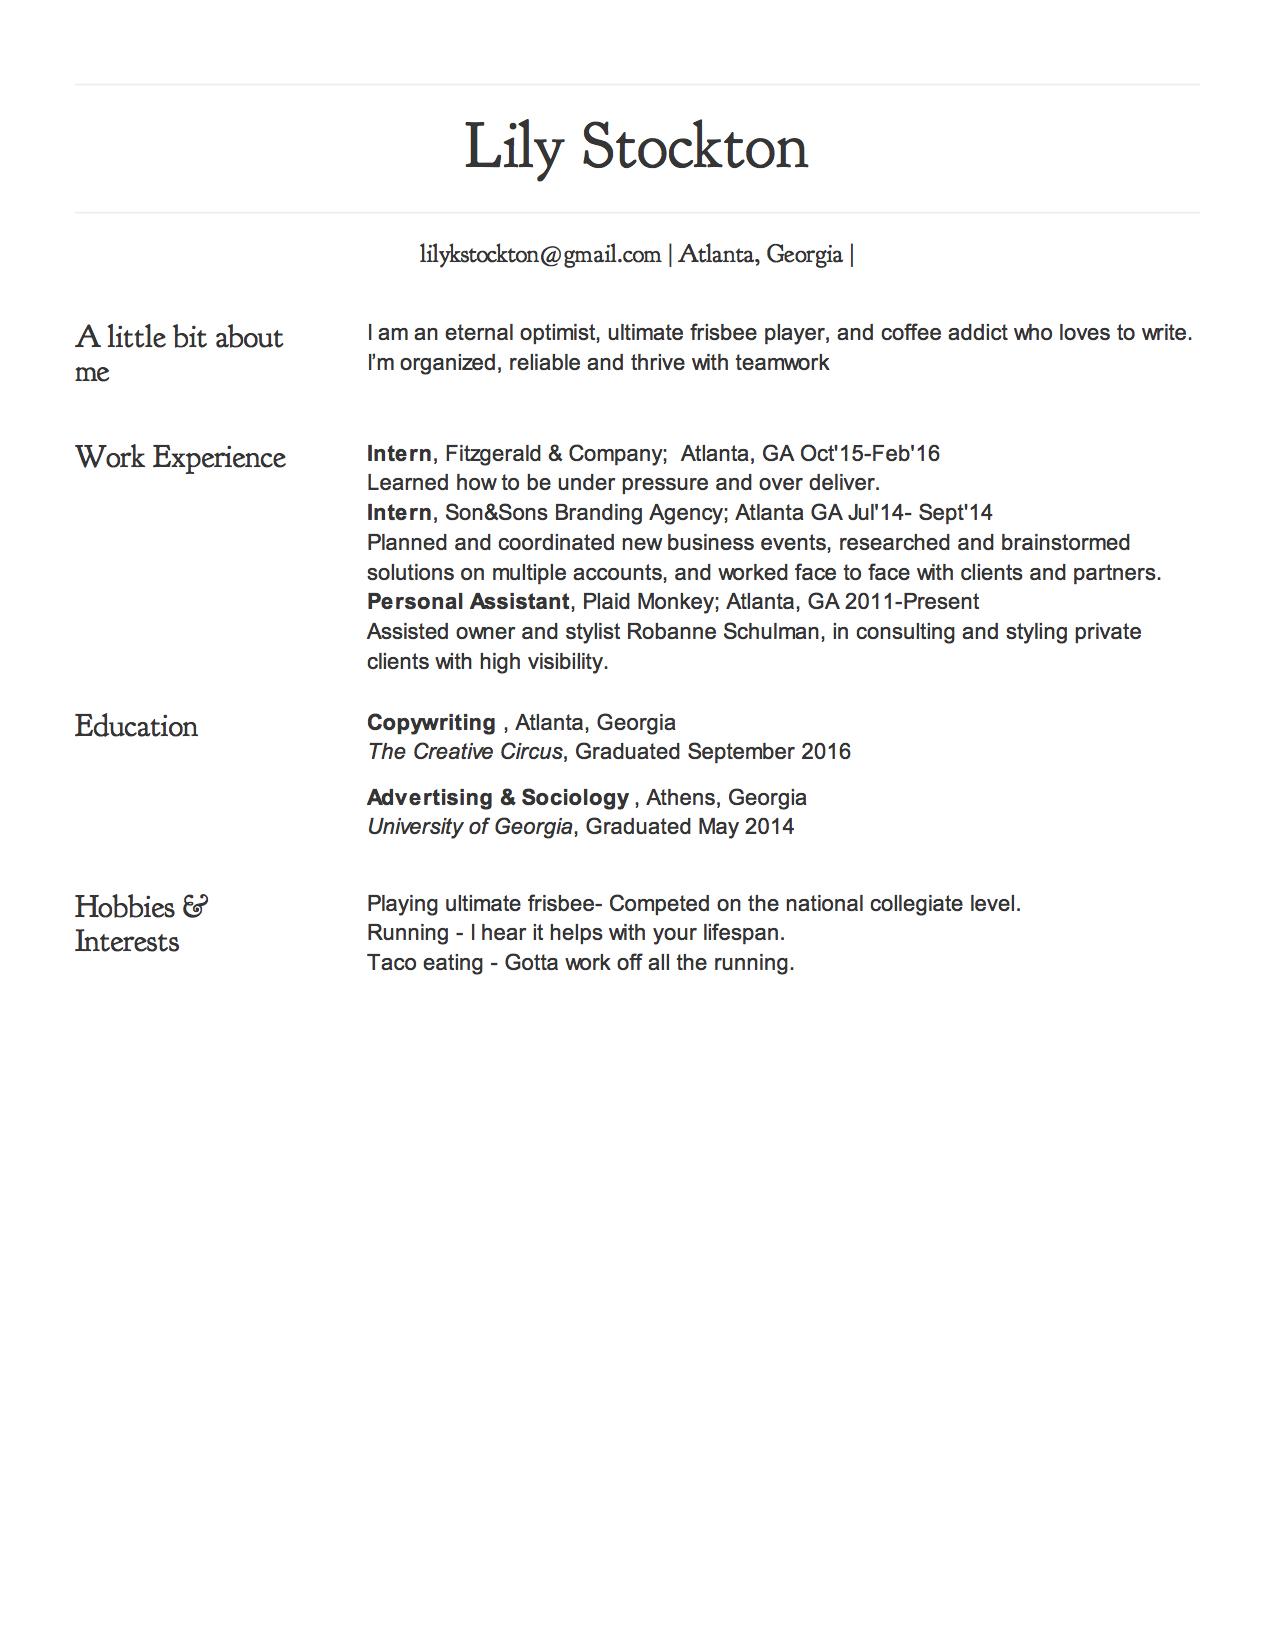 my_resume.jpg